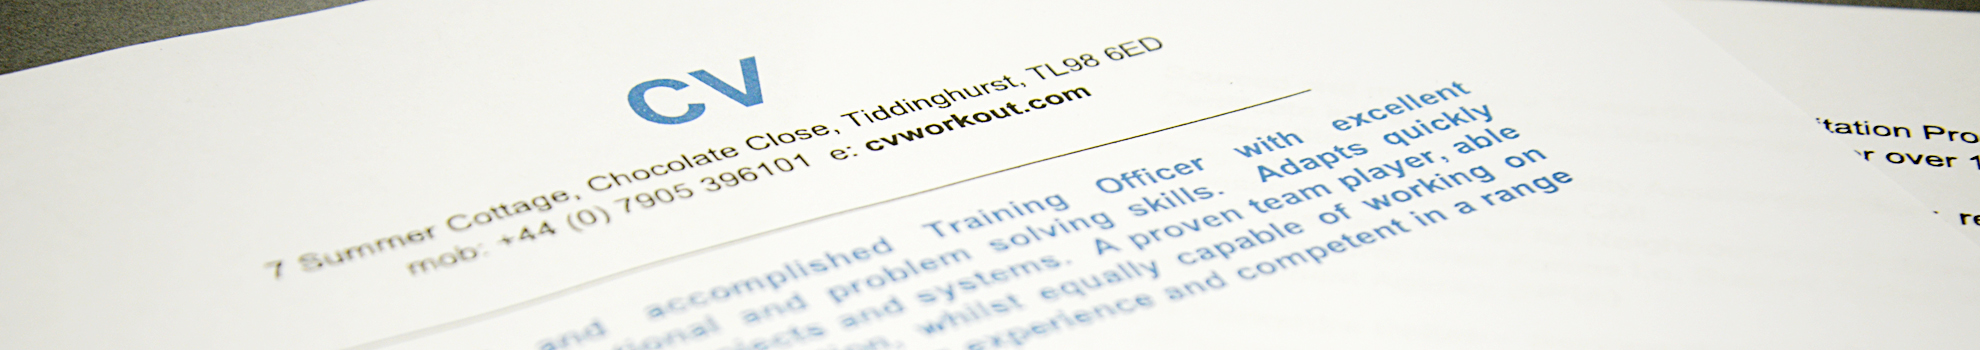 Graduate | CV Workout